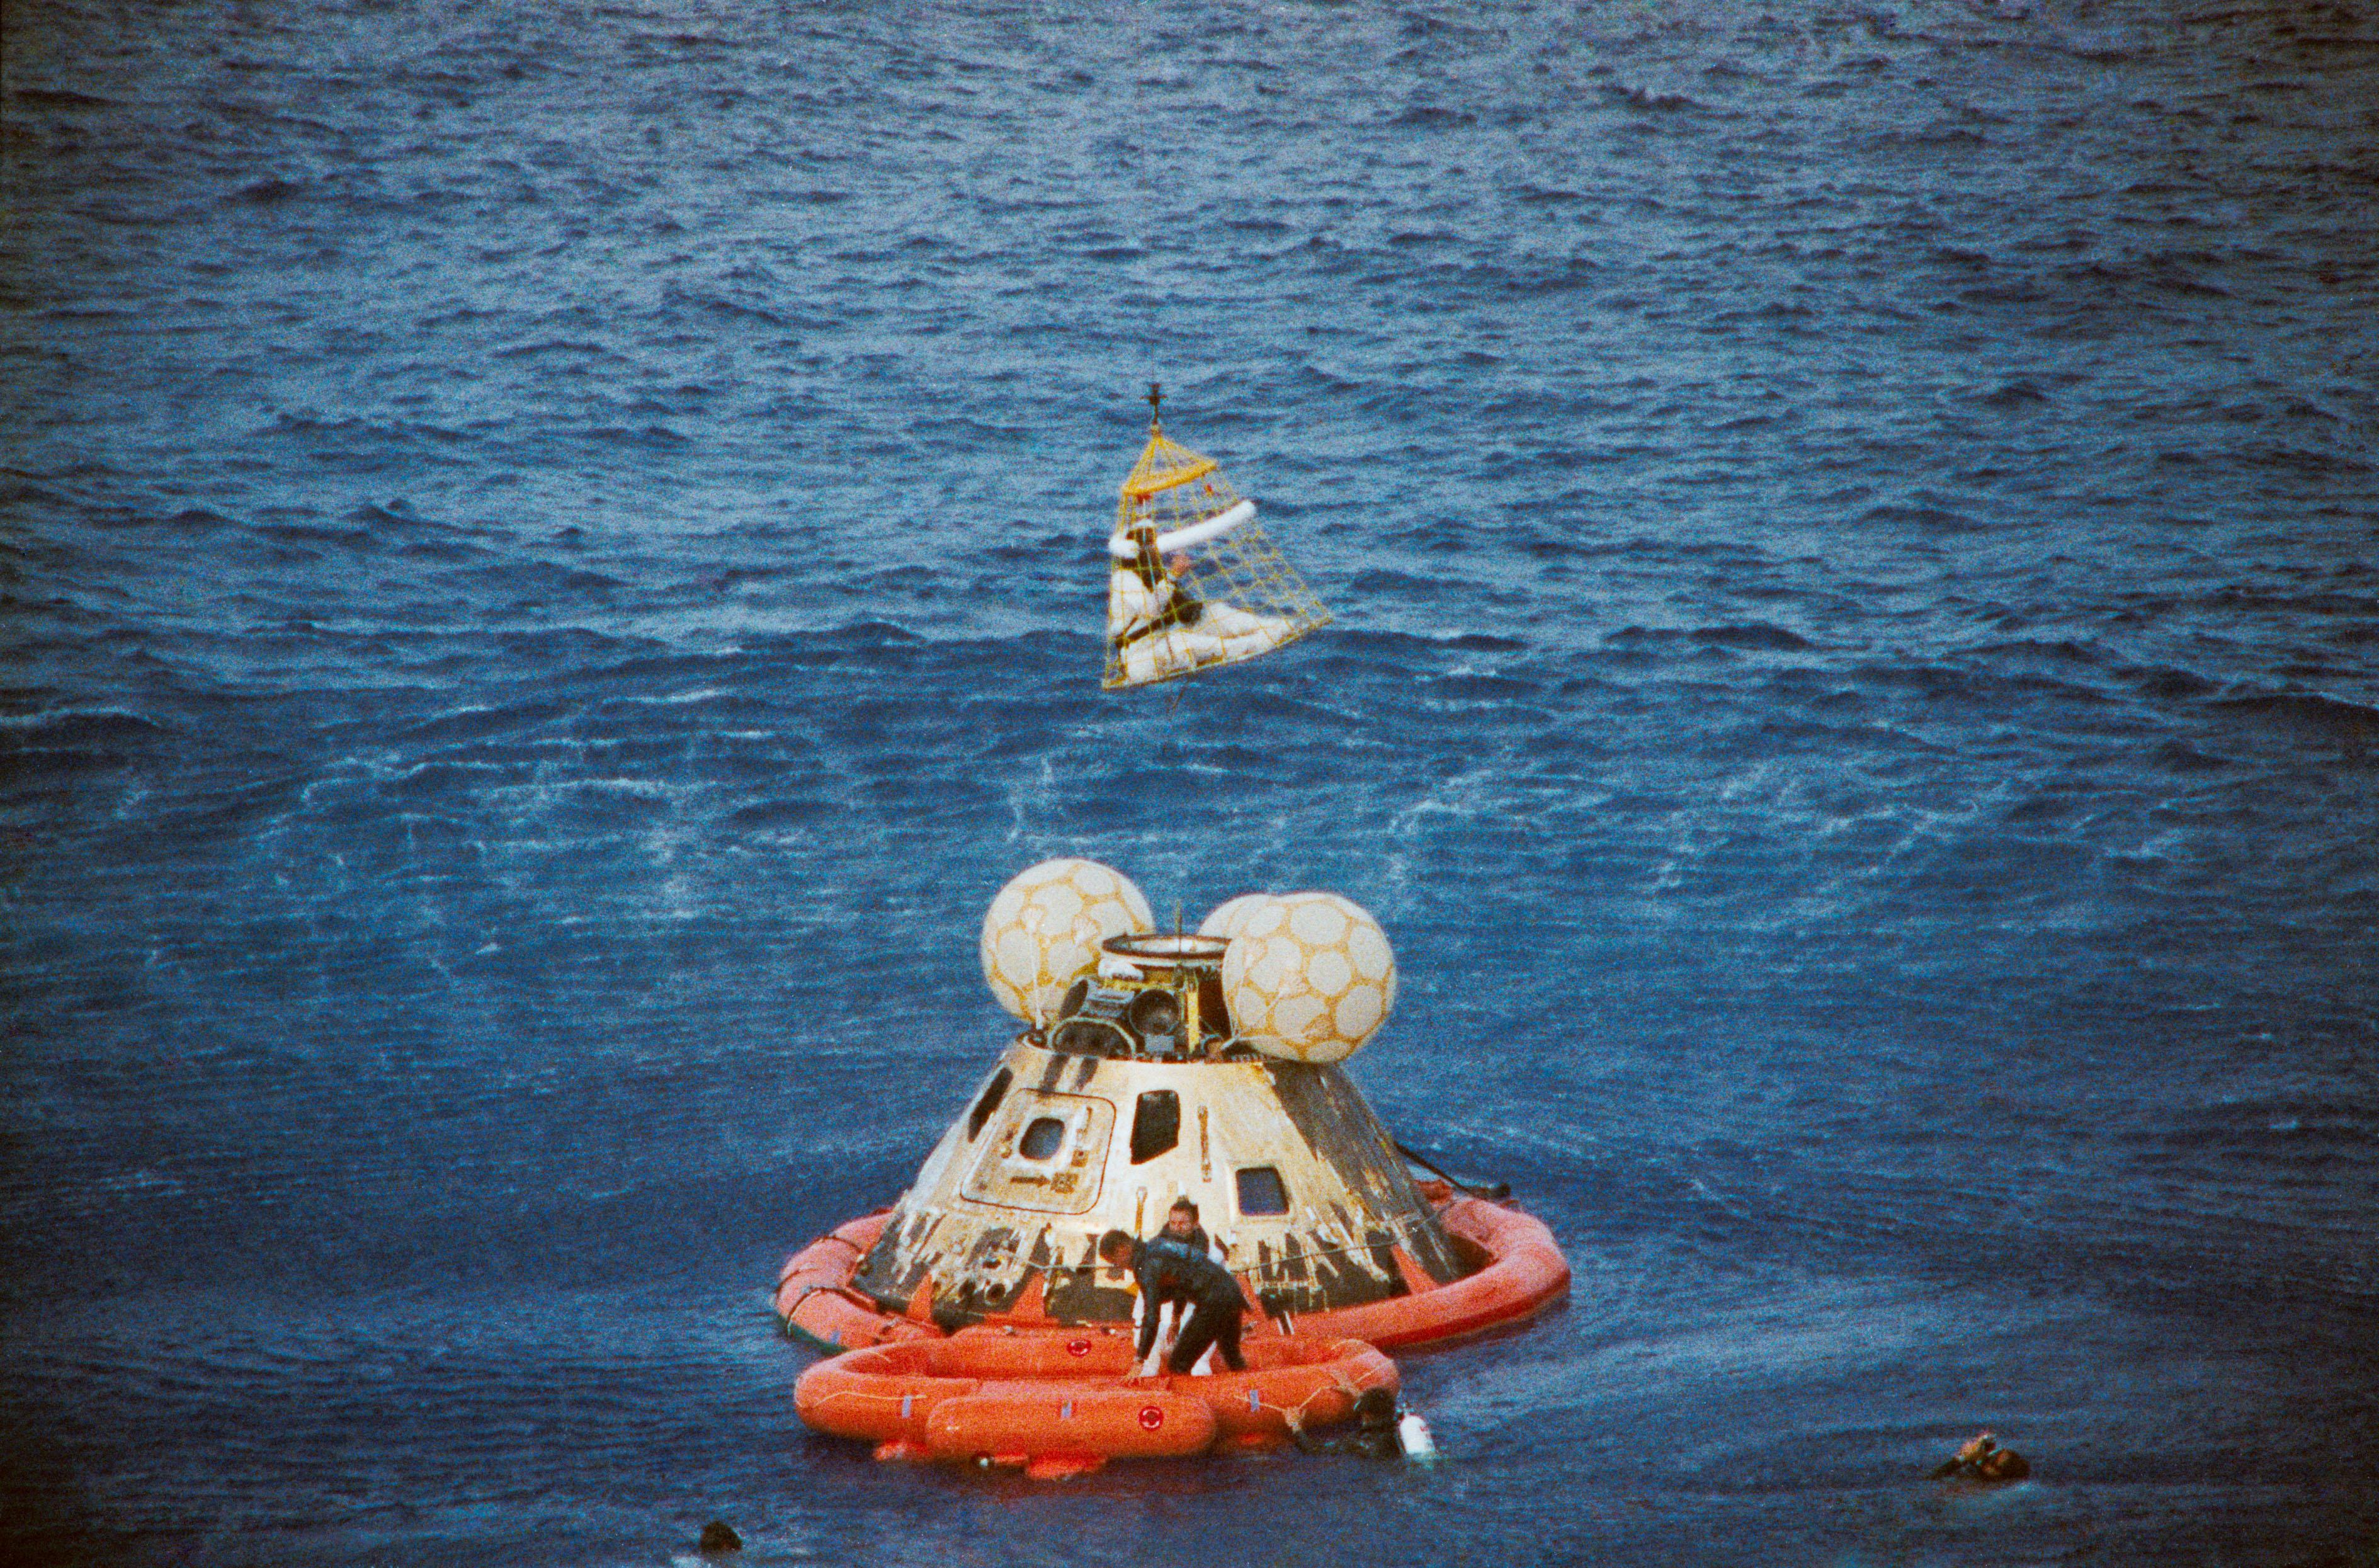 File:Apollo13 recovery.jpg - Wikimedia Commons